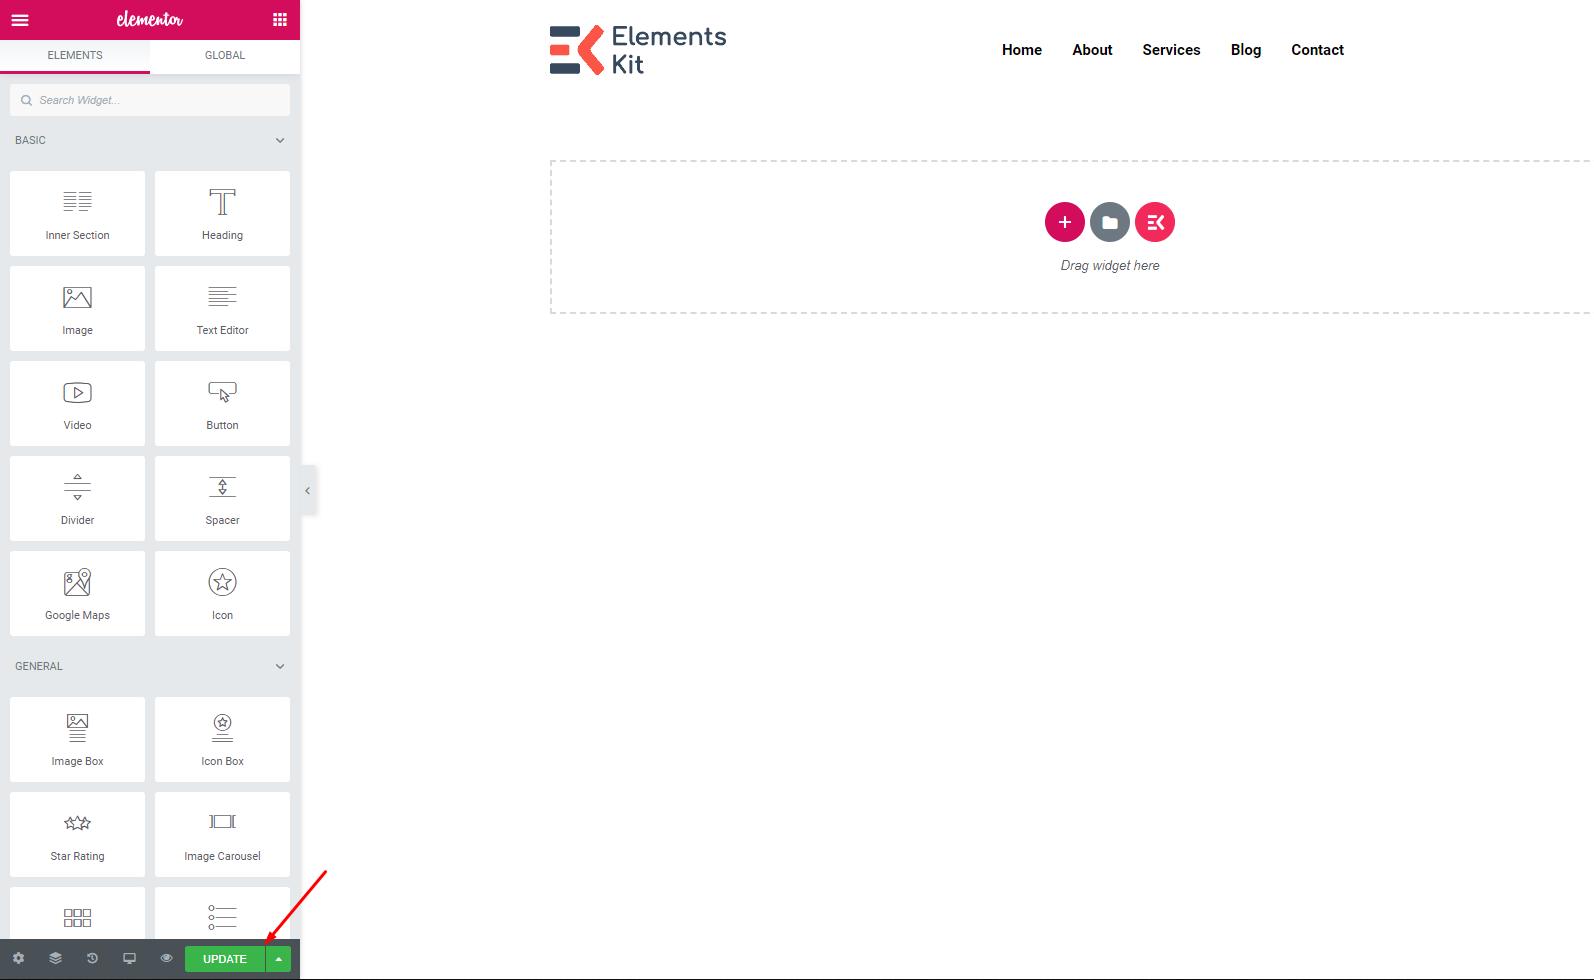 screenshot 4 » WordPress外贸,WordPress外贸模板,WordPress外贸网站,WordPress外贸主题